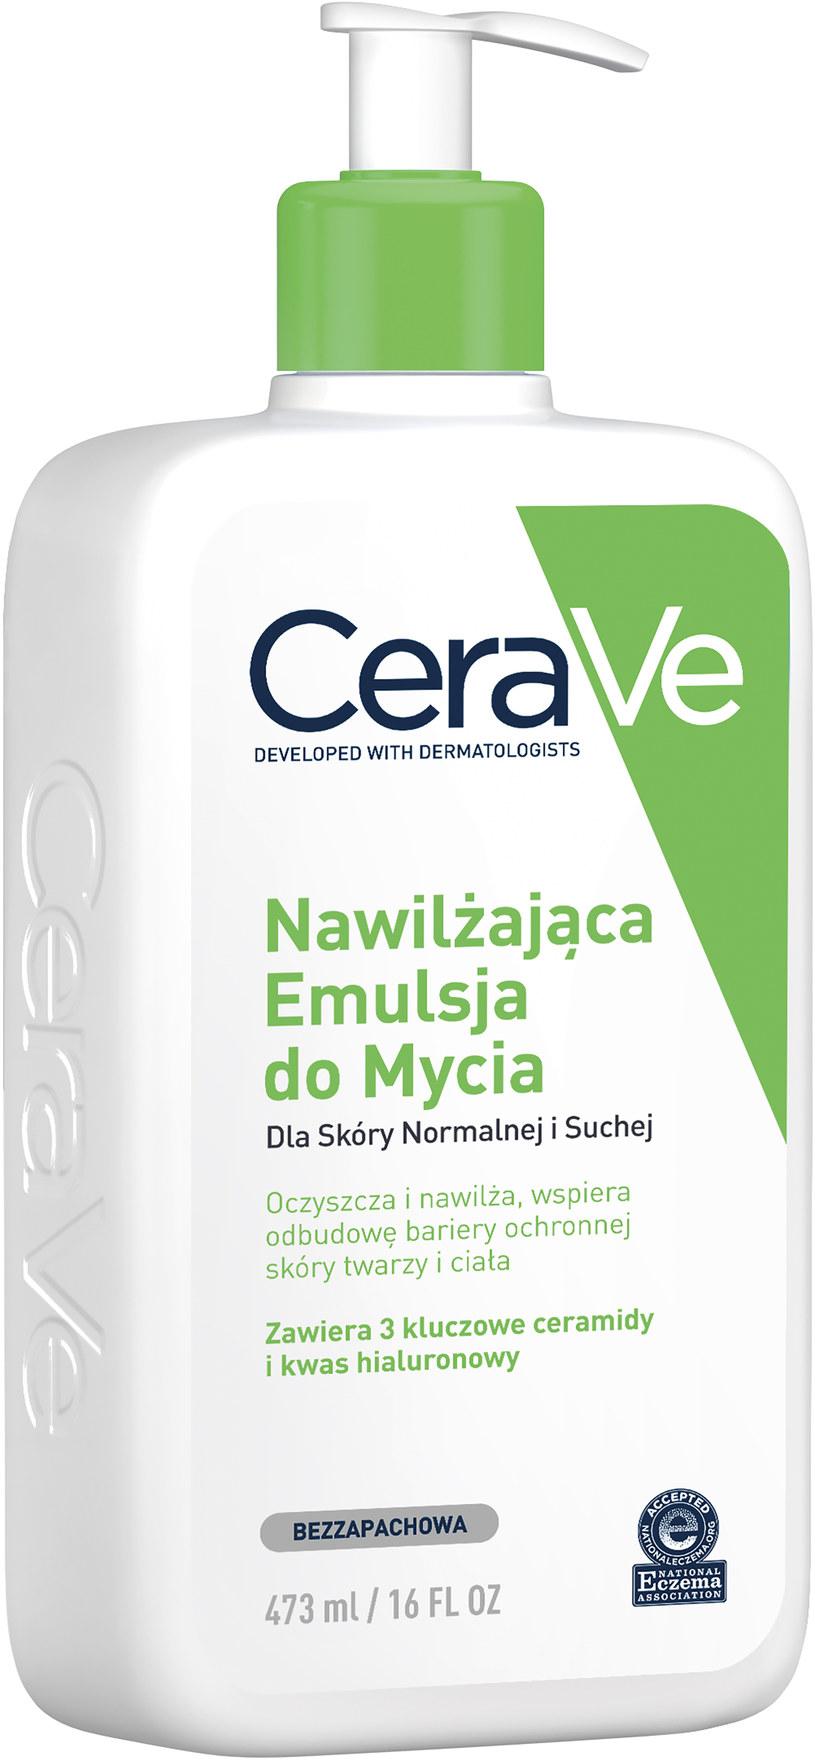 Nawilżająca emulsja do mycia do skóry suchej i normalnej CeraVe /INTERIA.PL/materiały prasowe